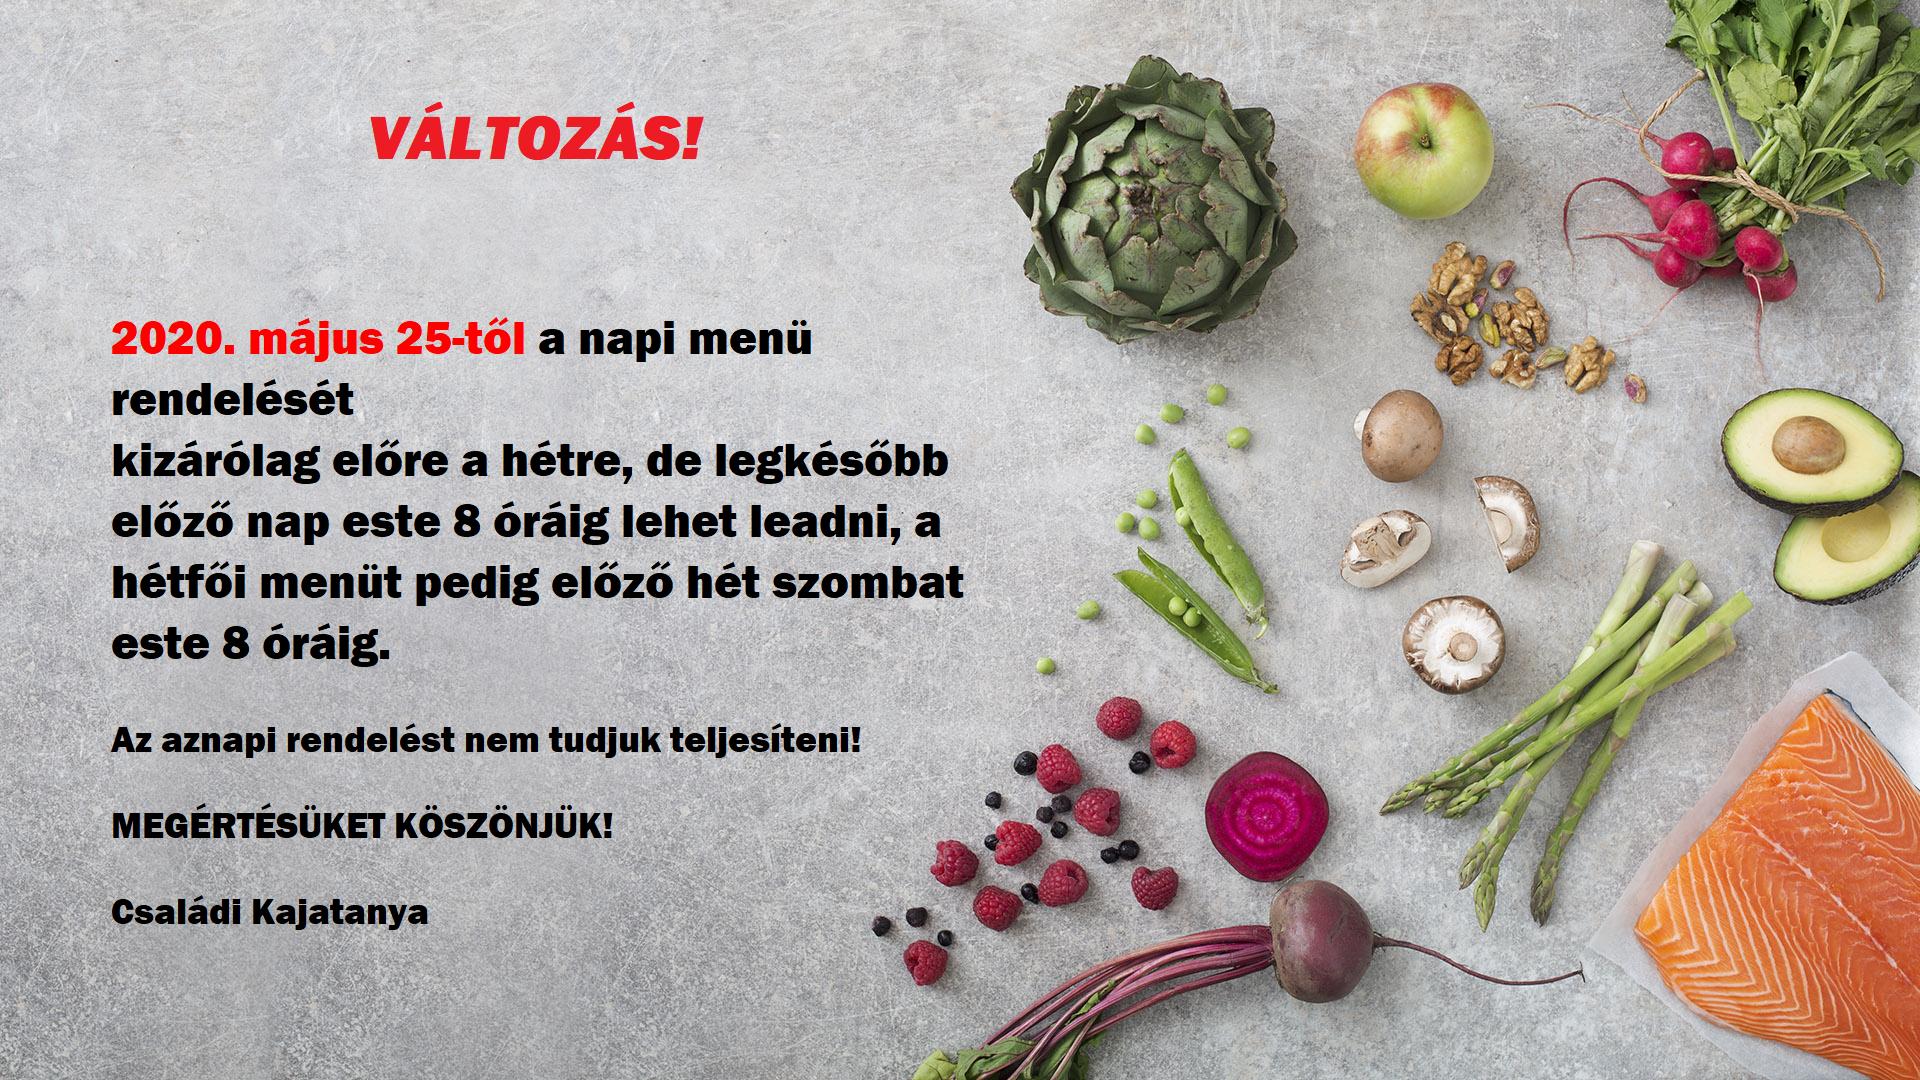 kajatanya_napi_menu